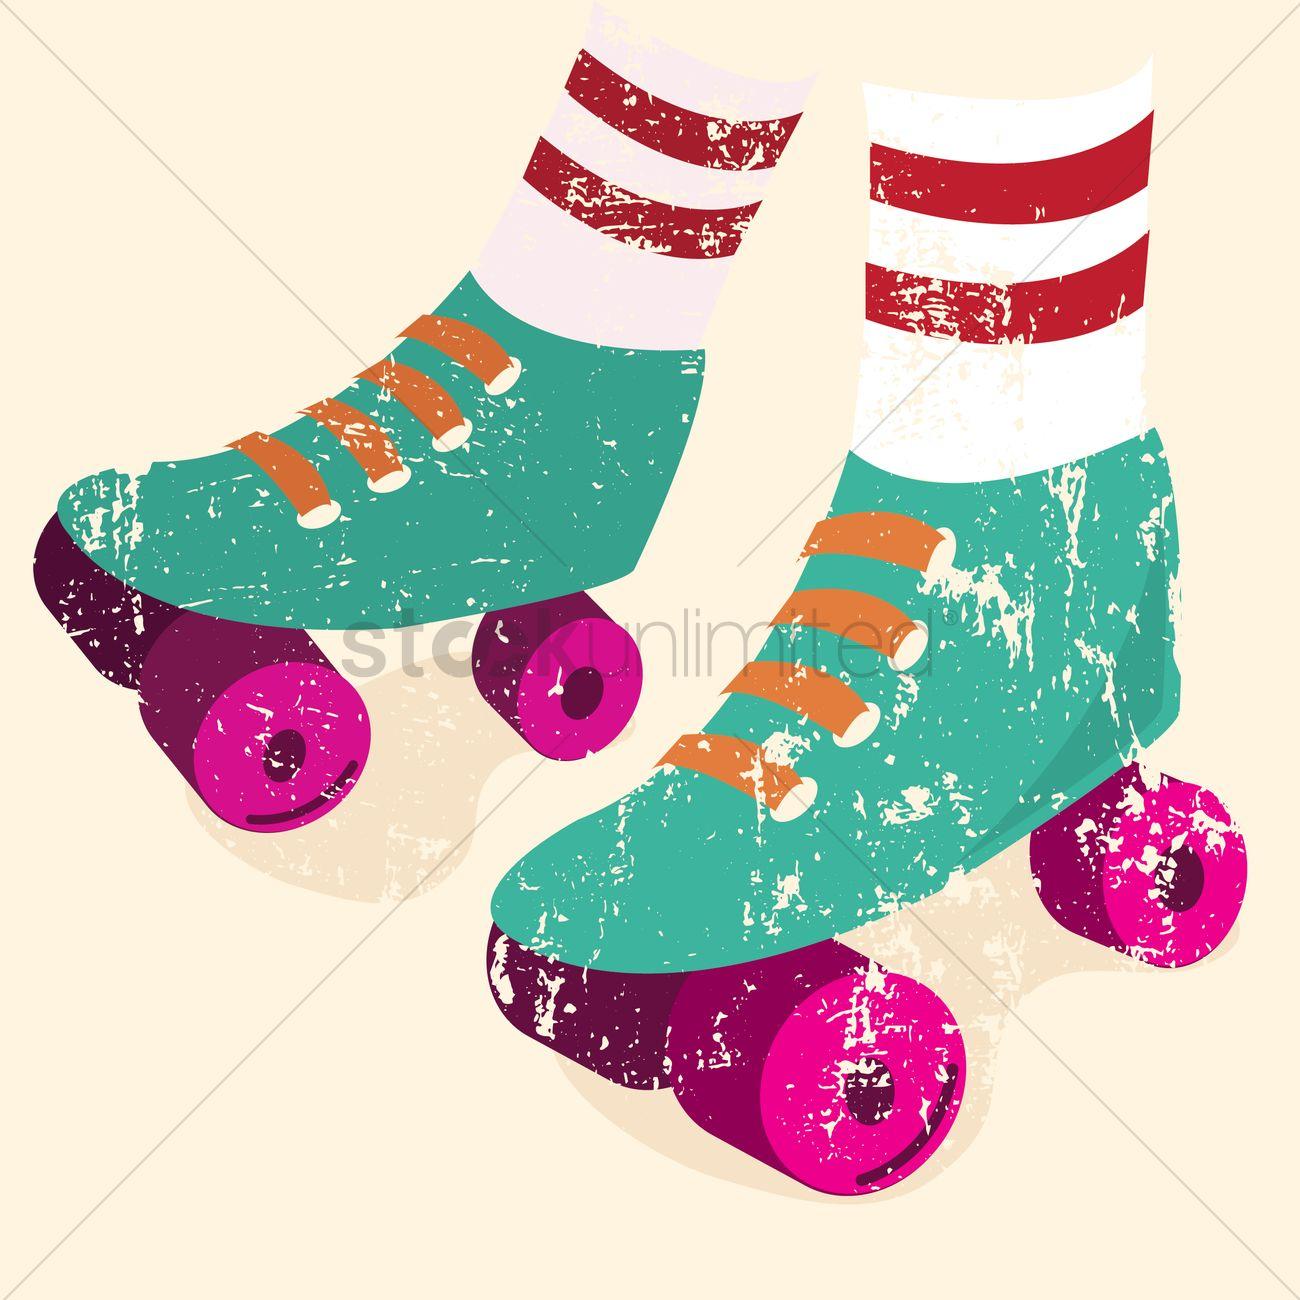 Roller skates for free - Free Roller Skates Vector Graphic